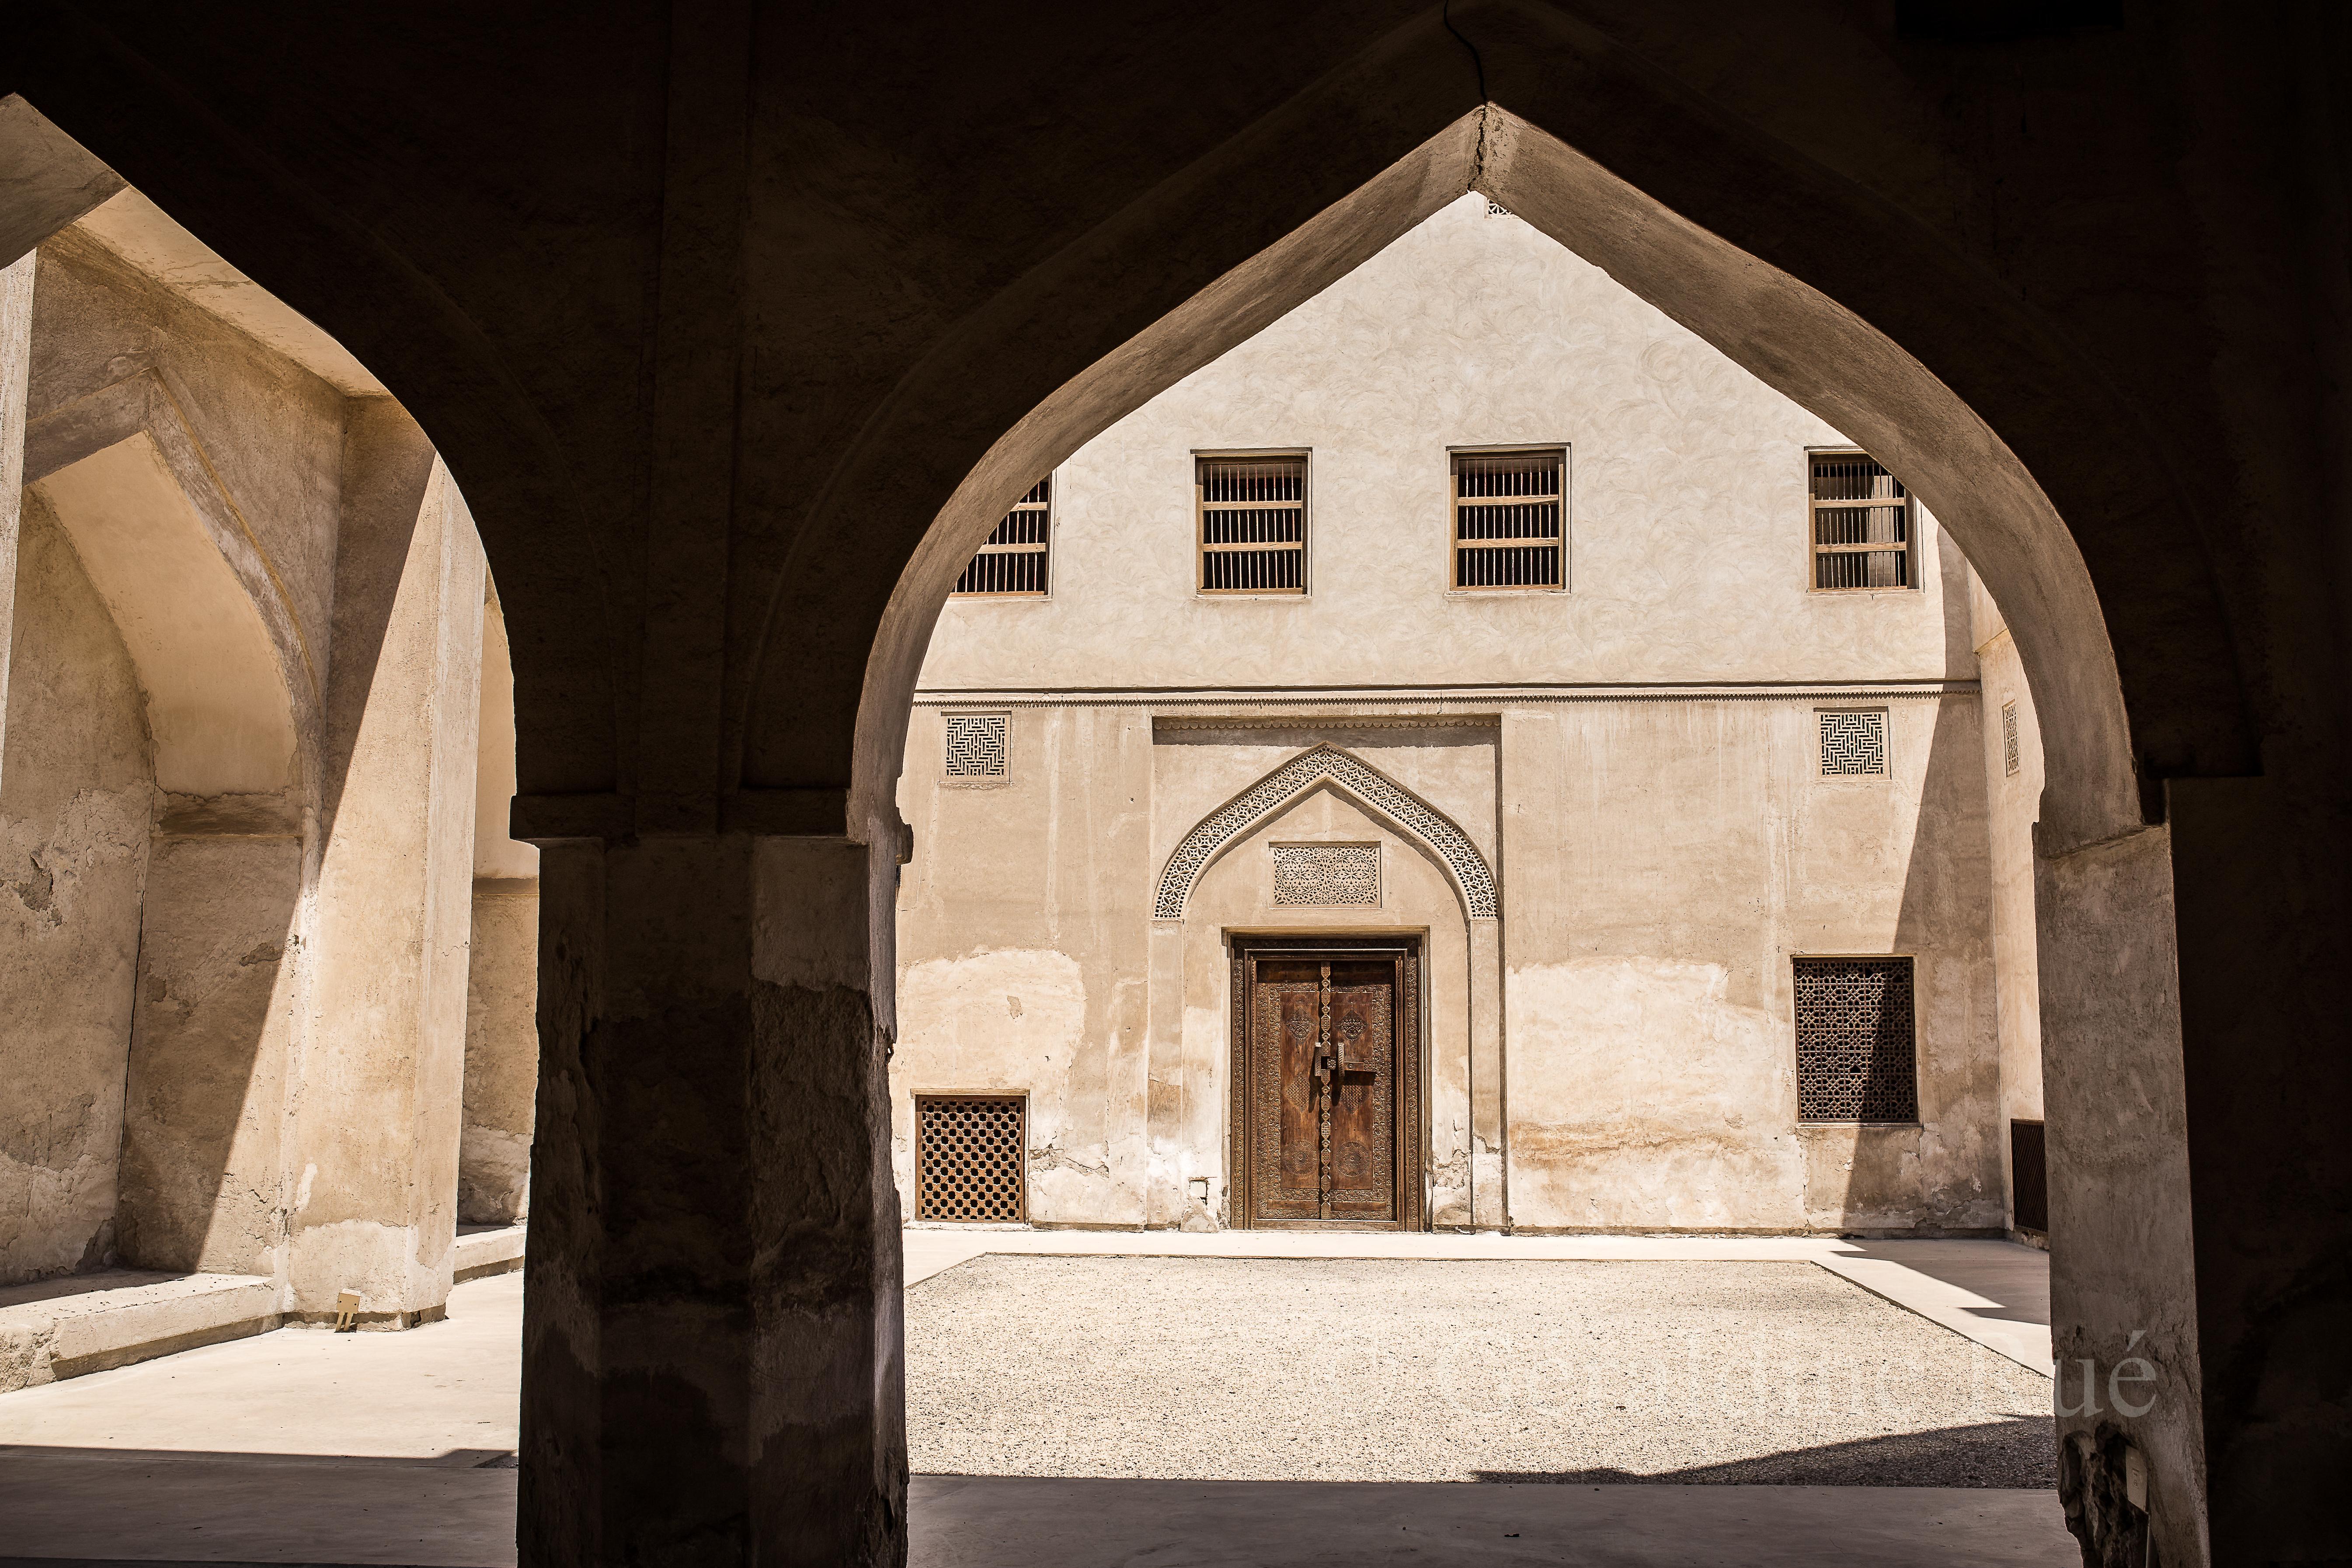 Bahrein7809© Géraldine Rué